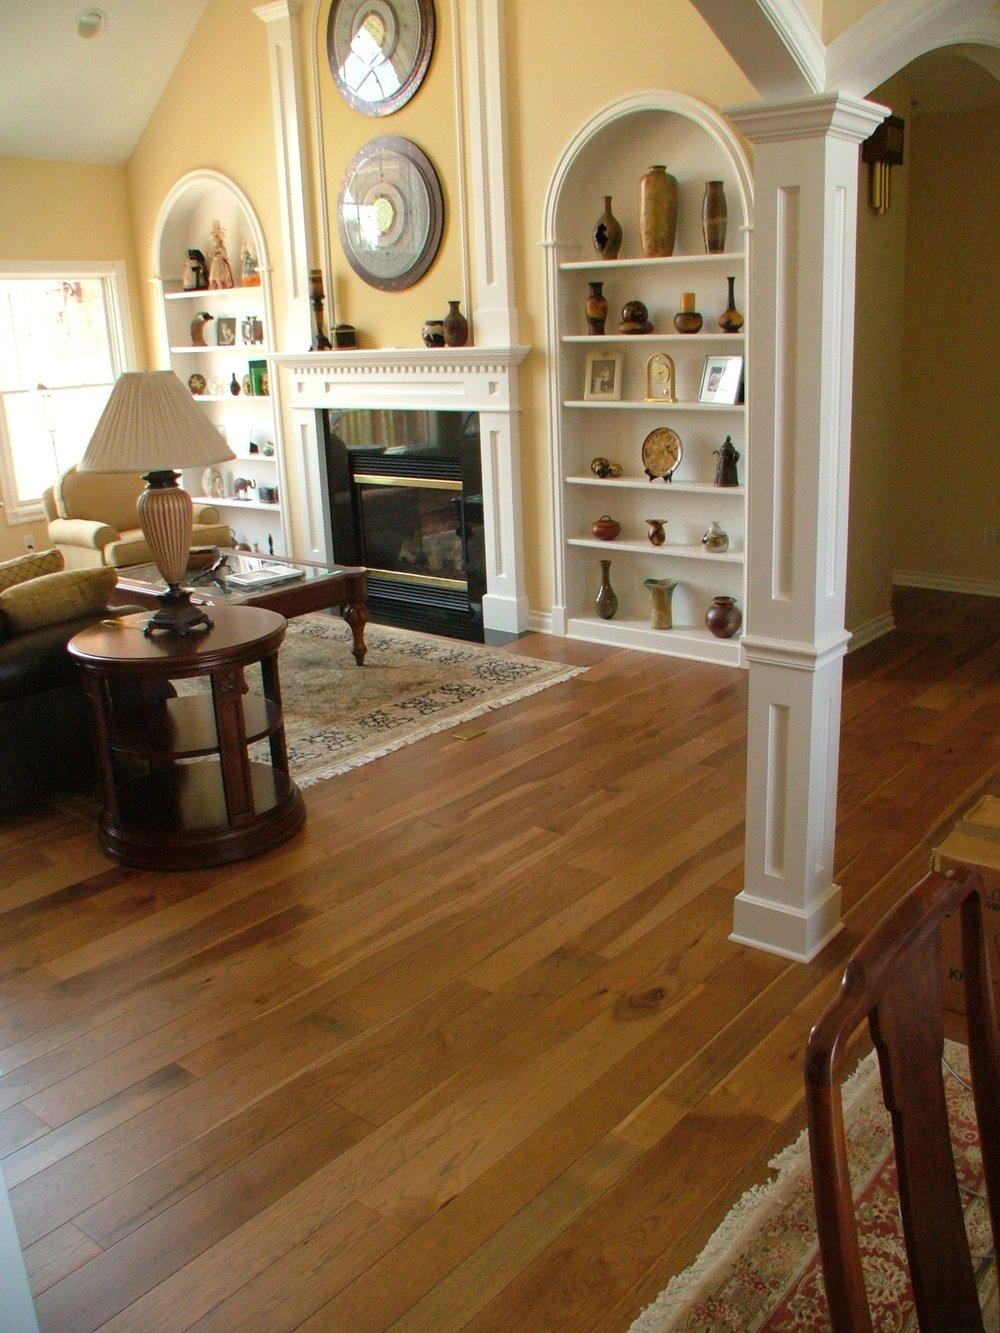 Coffee Hickory Boardwalk Hardwood Floors